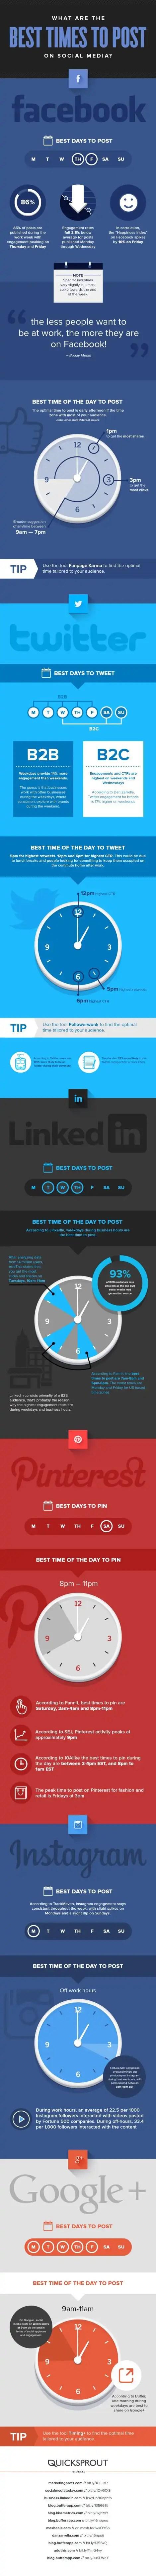 infografia-publicar-social-media